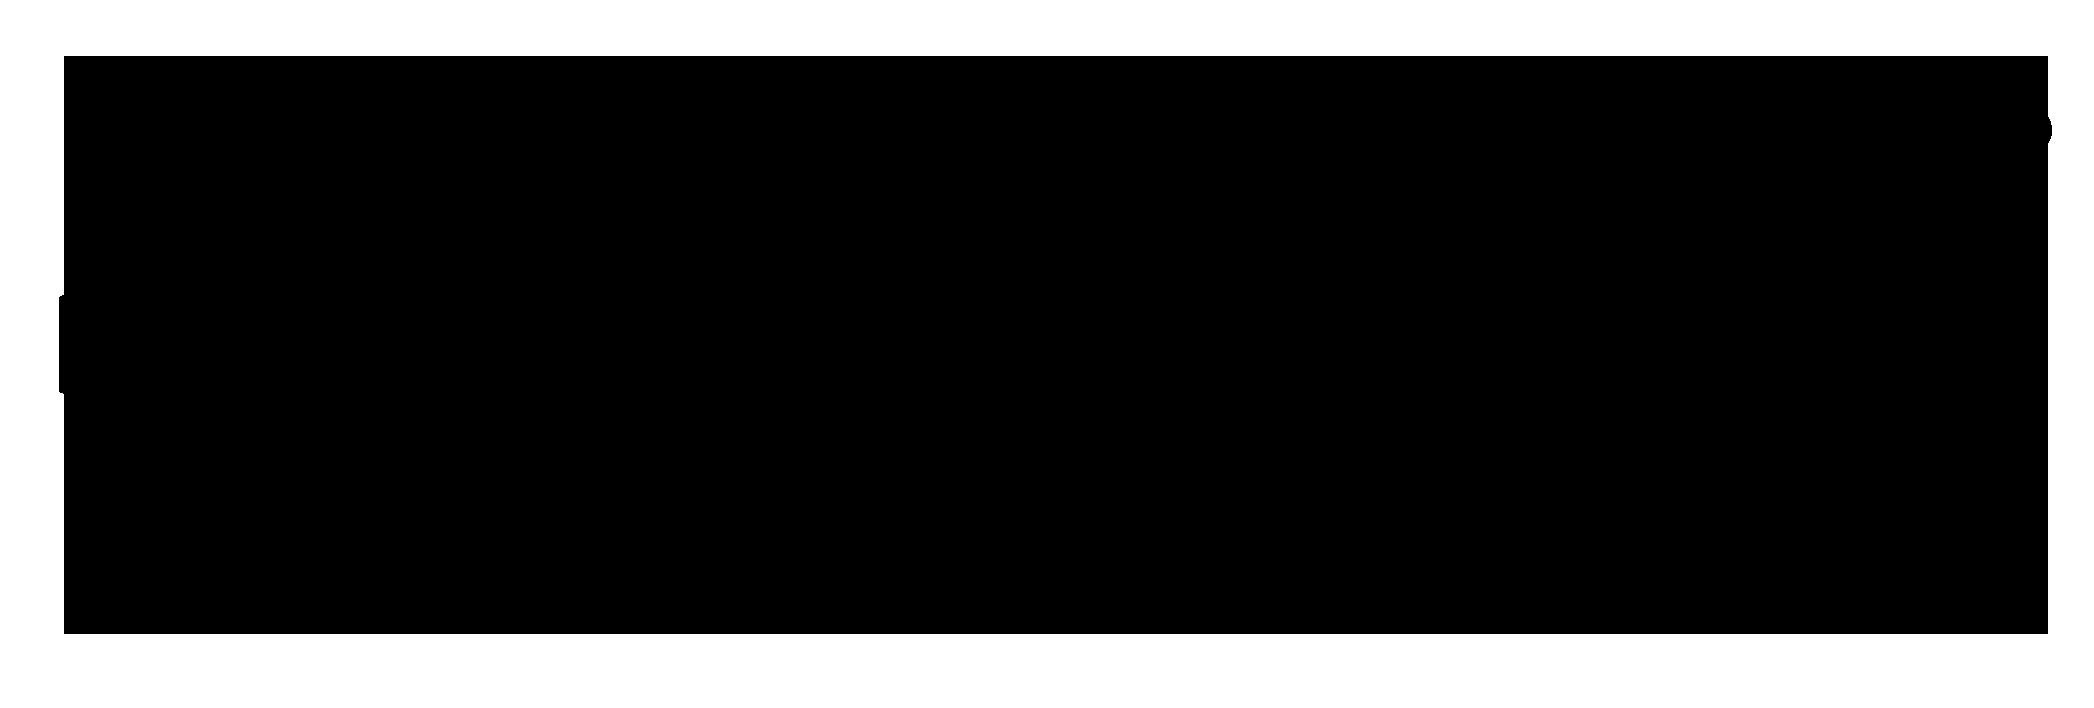 Ign-logo copy.png